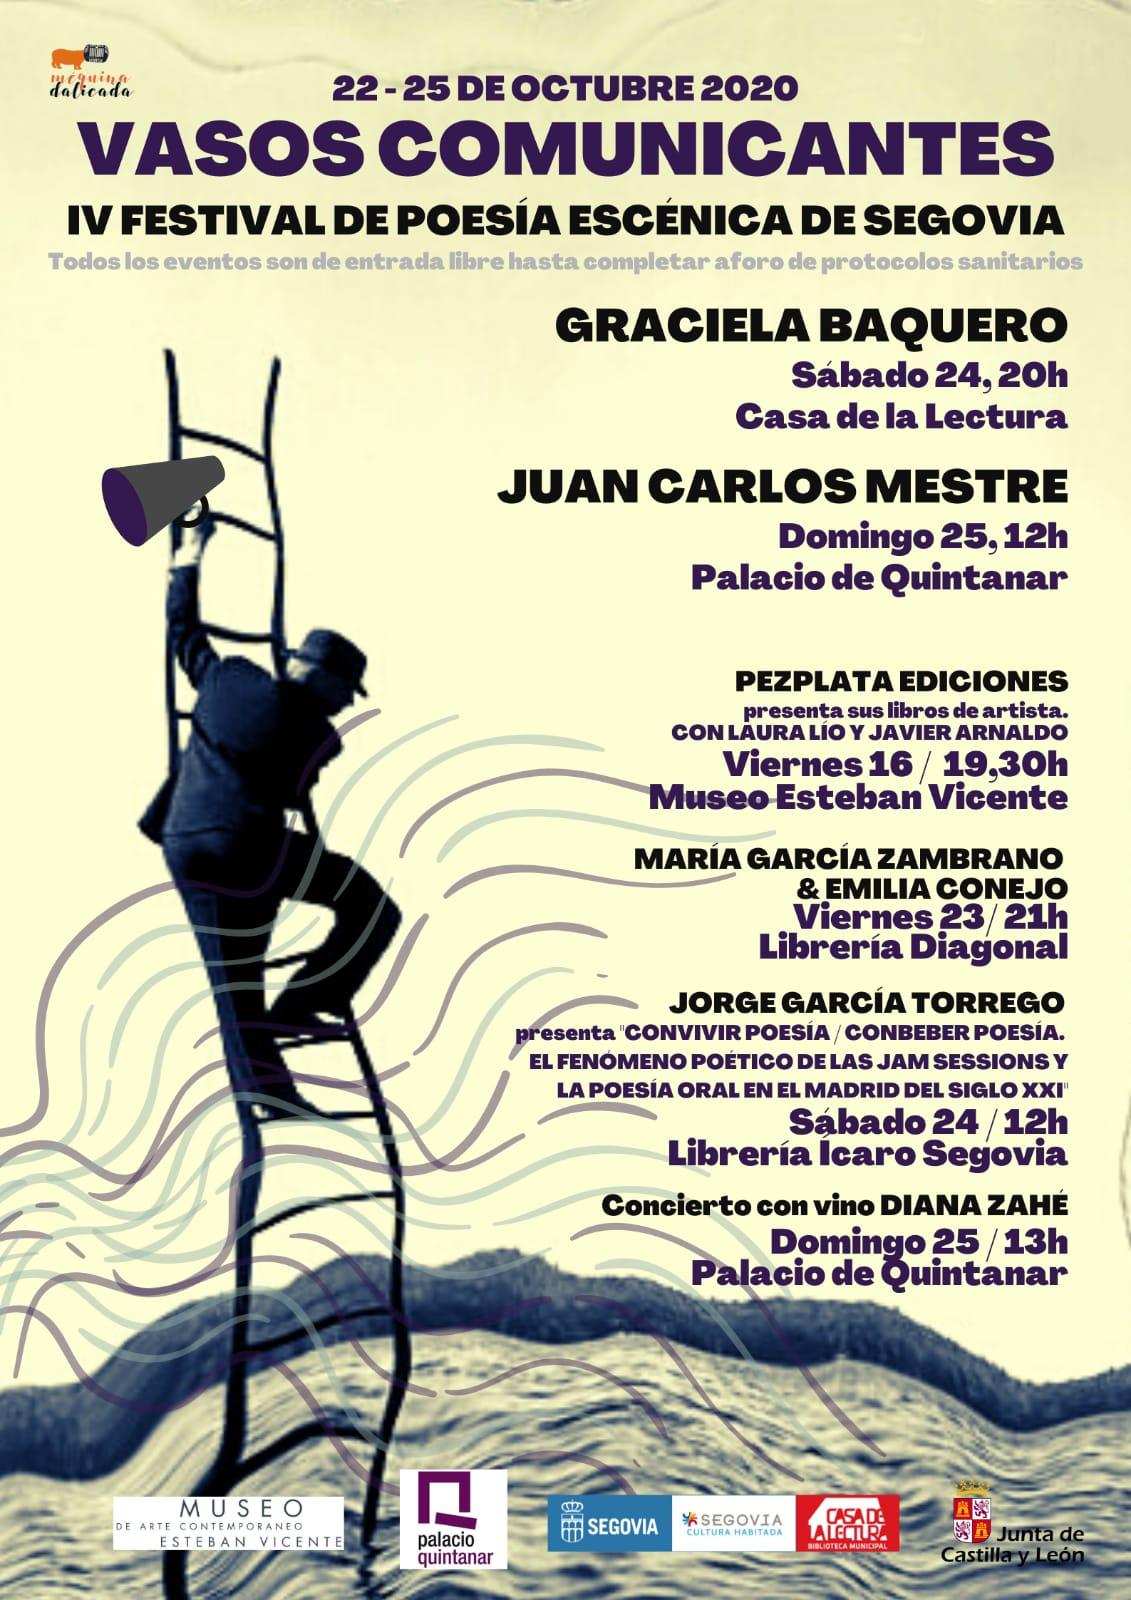 VASOS COMUNICANTES. IV Festival de poesía escénica de Segovia